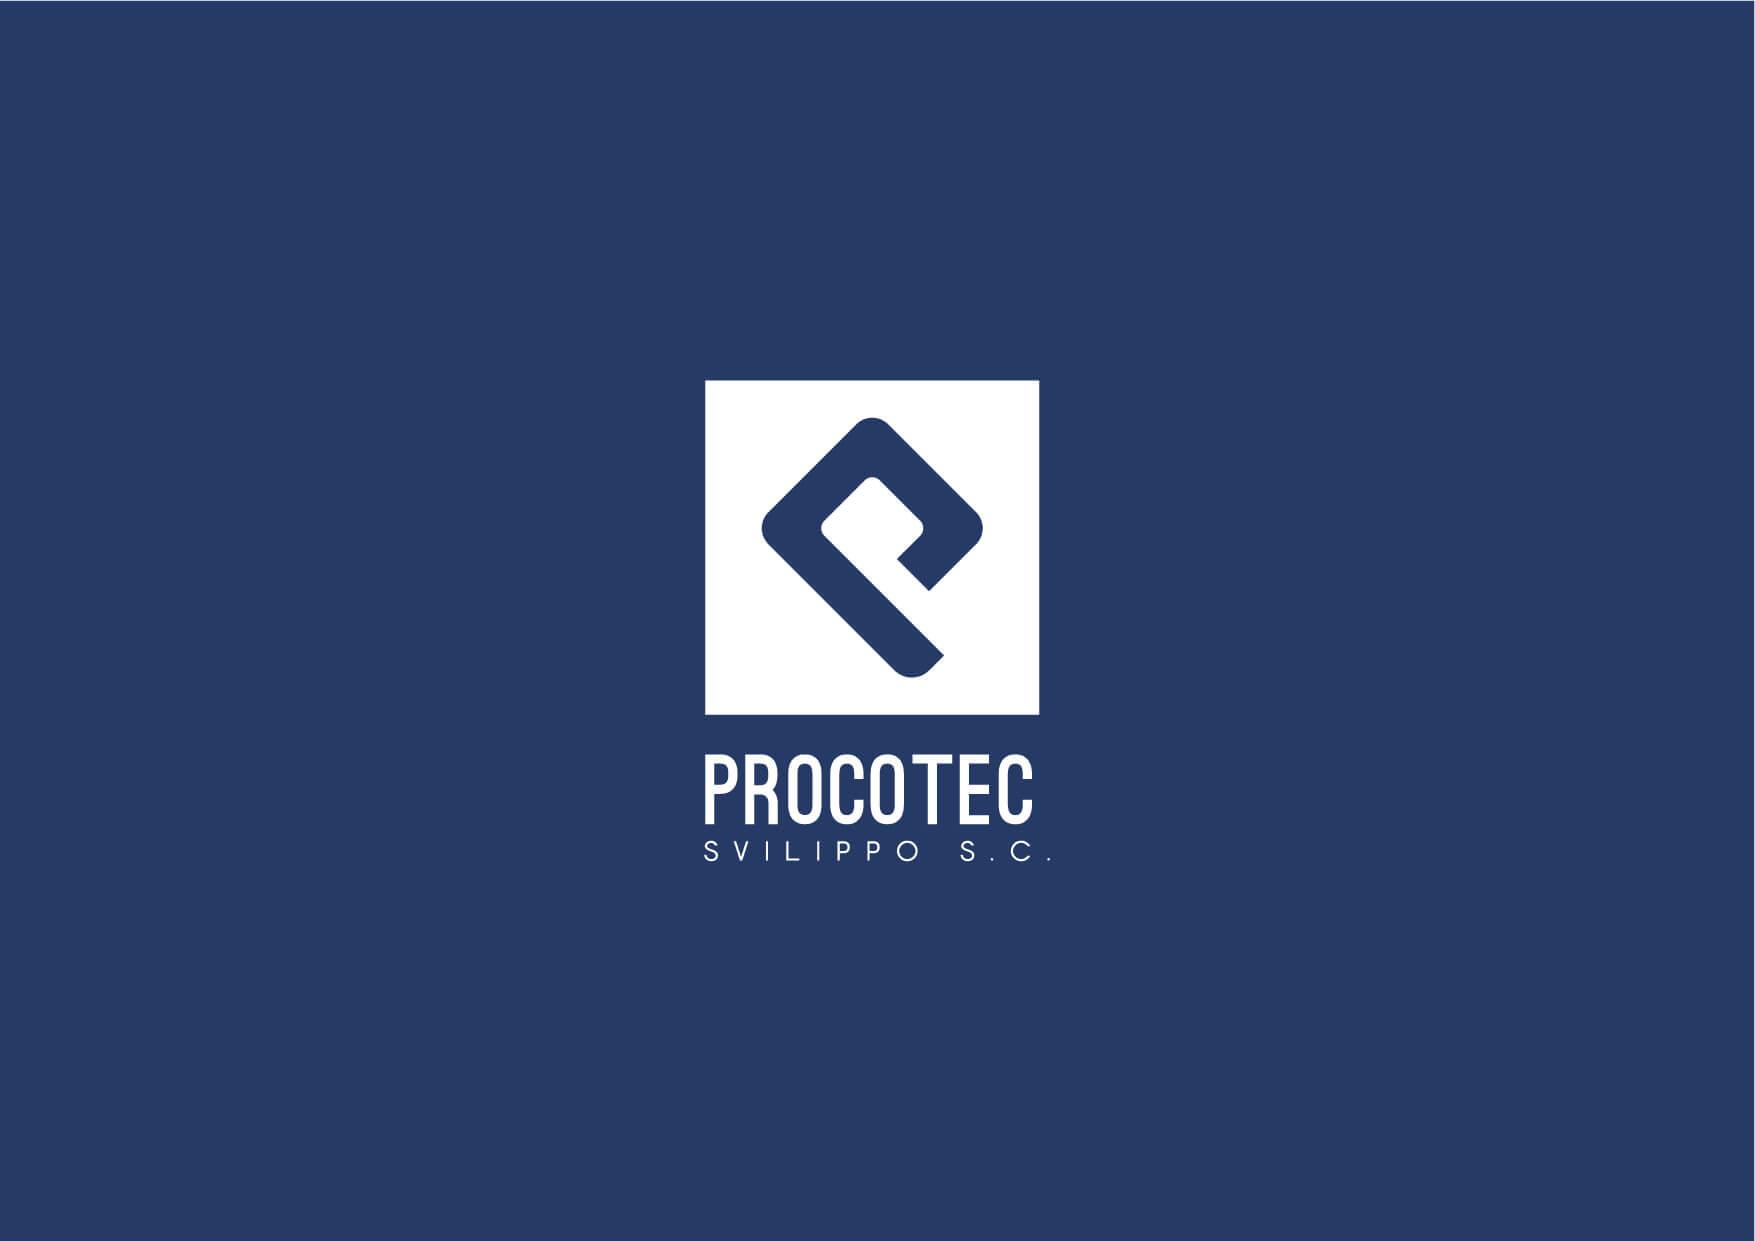 bbadv-mockup-procotec-logo-corporate-04